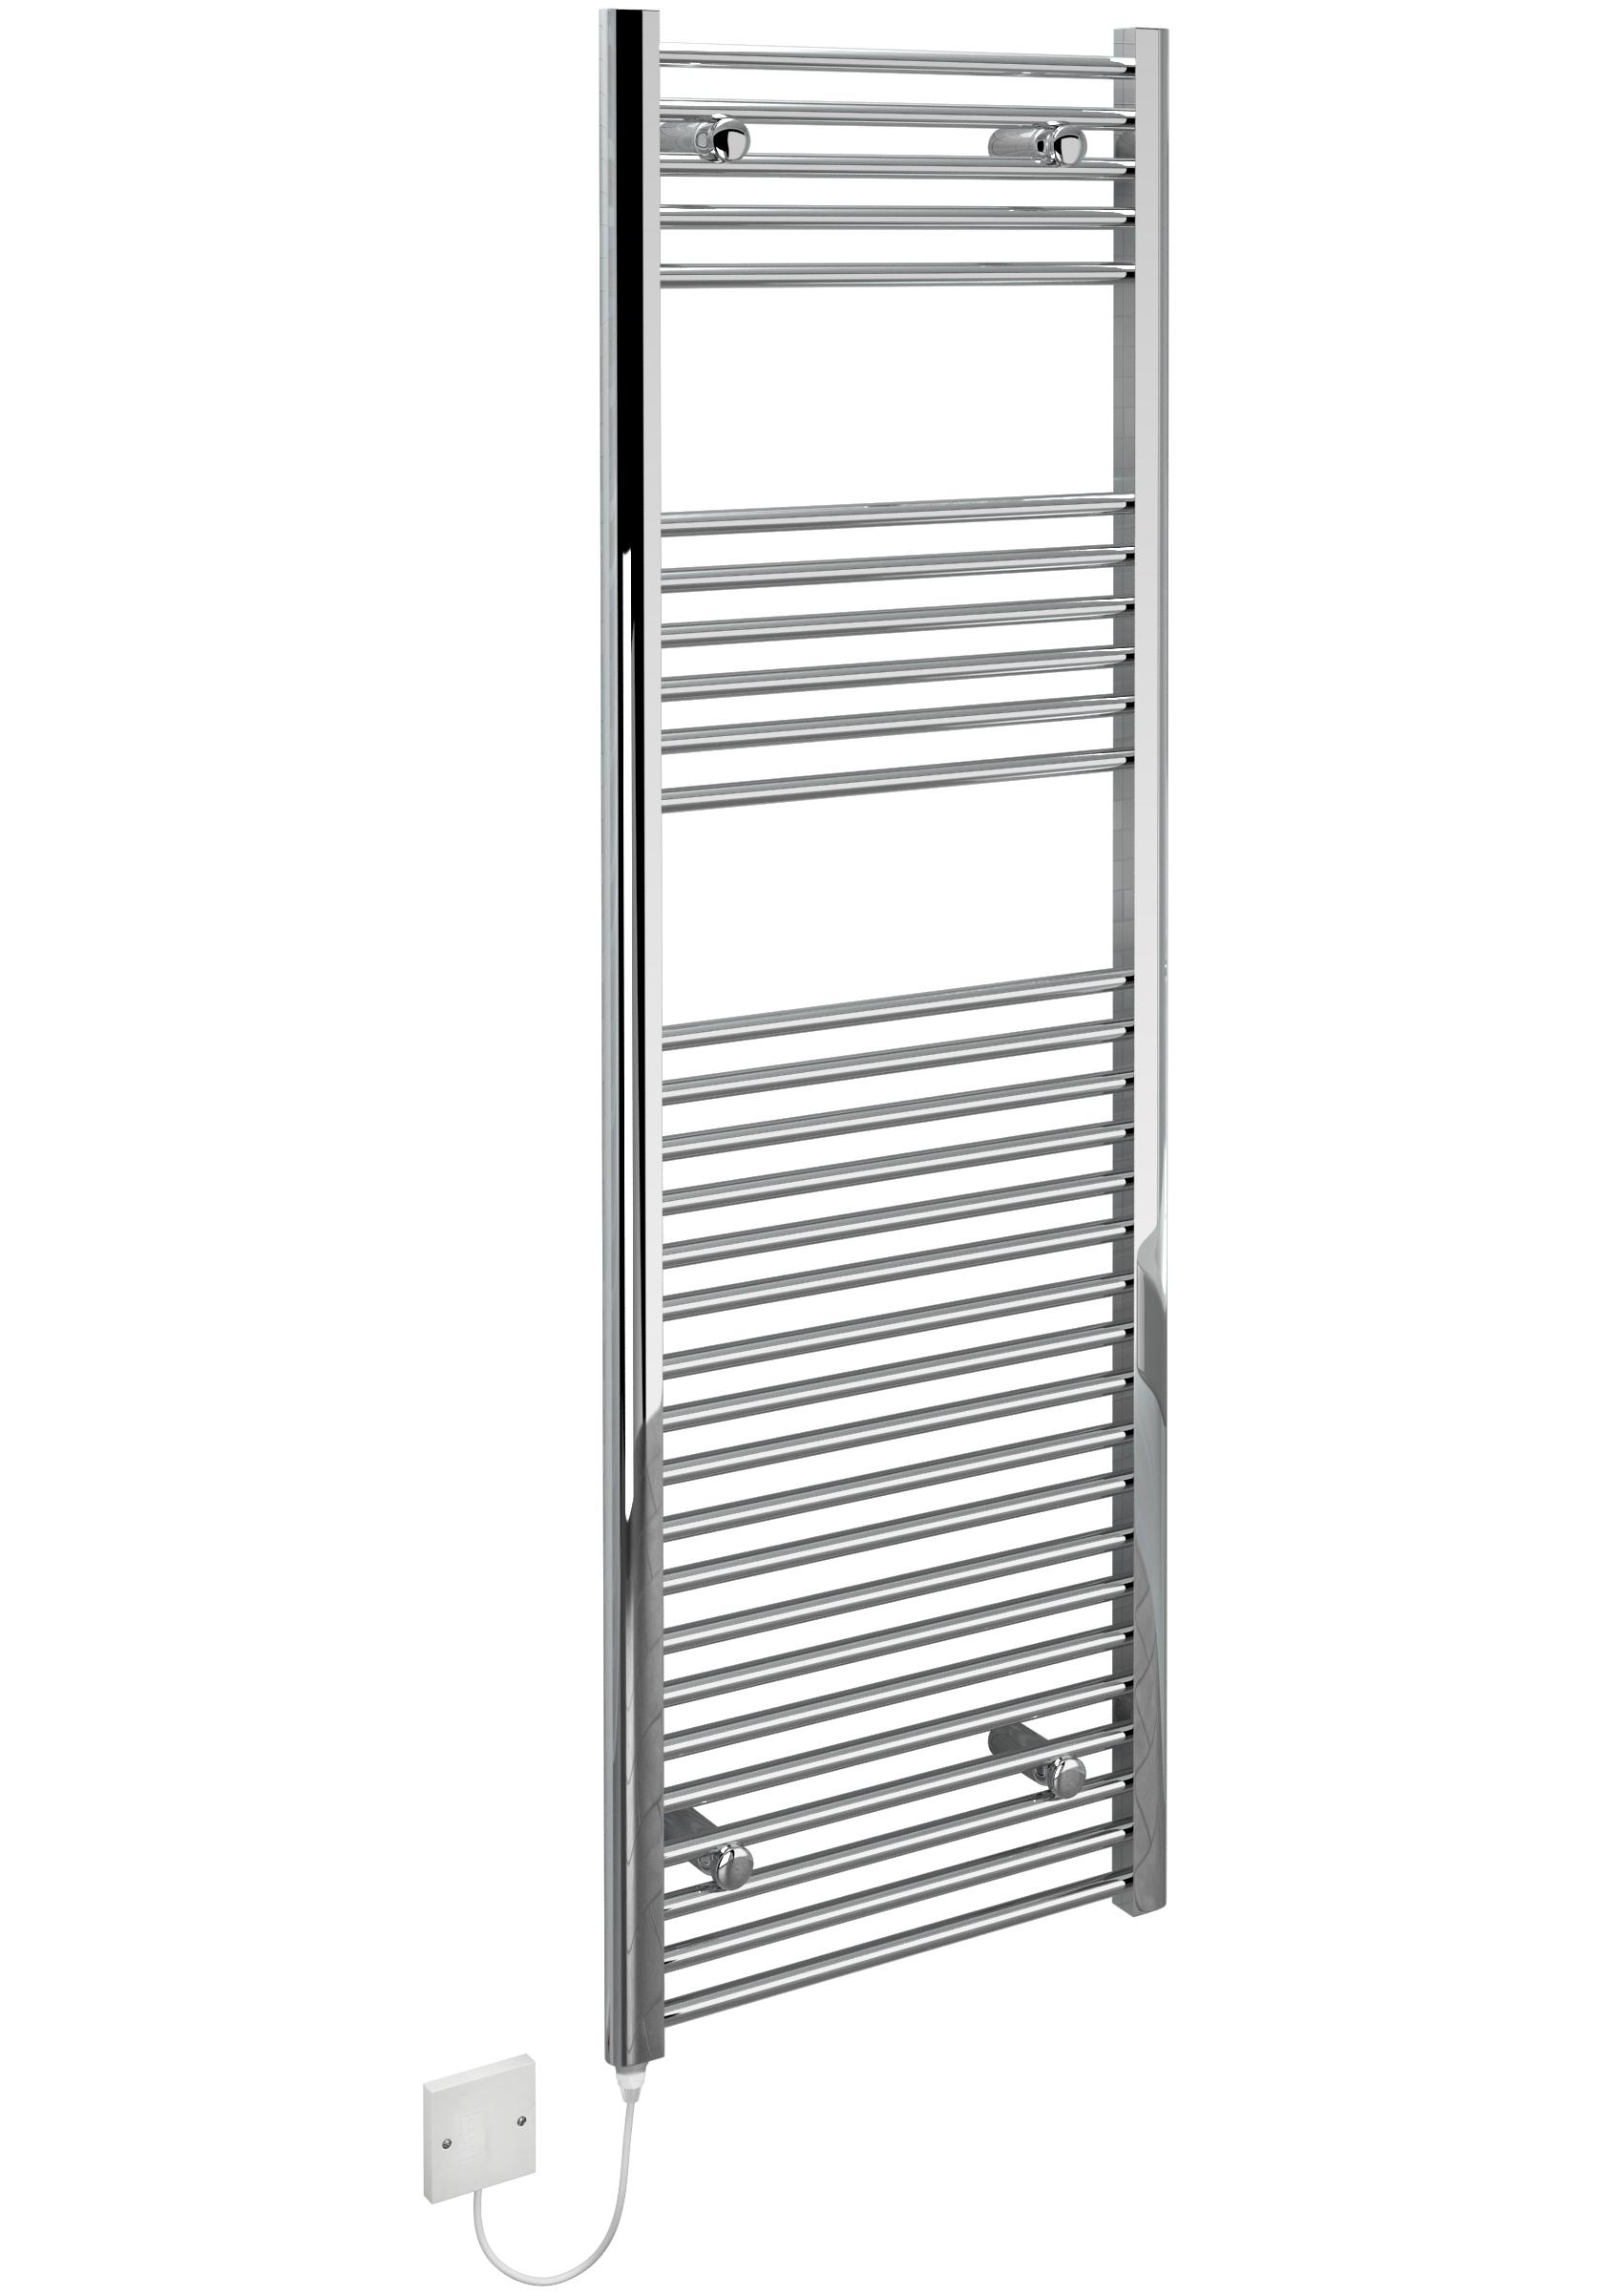 kudox electric towel rail chrome 400w  500 x 1500mm